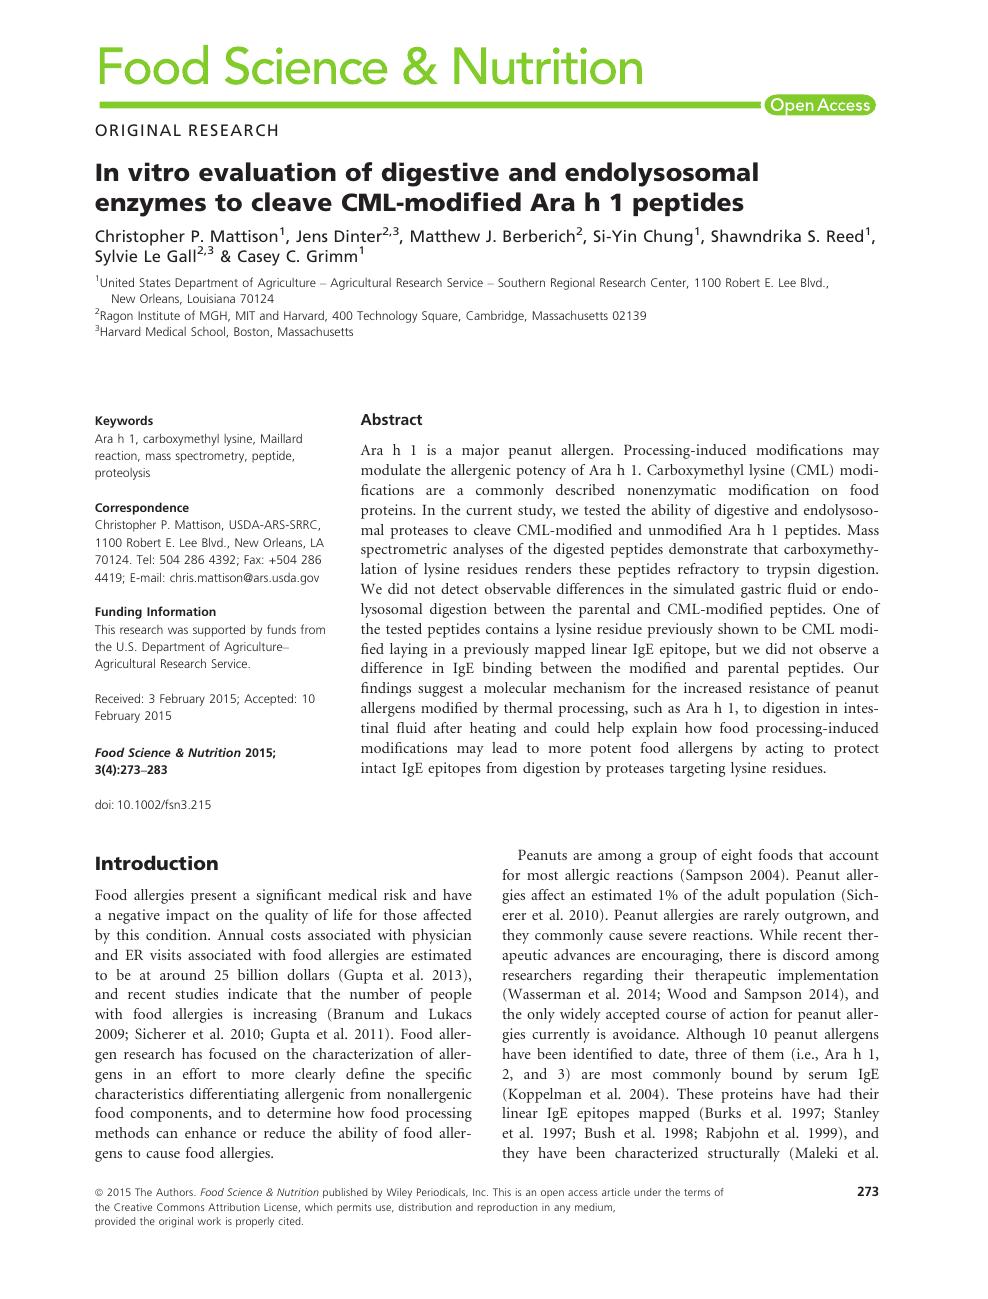 In vitro evaluation of digestive and endolysosomal enzymes